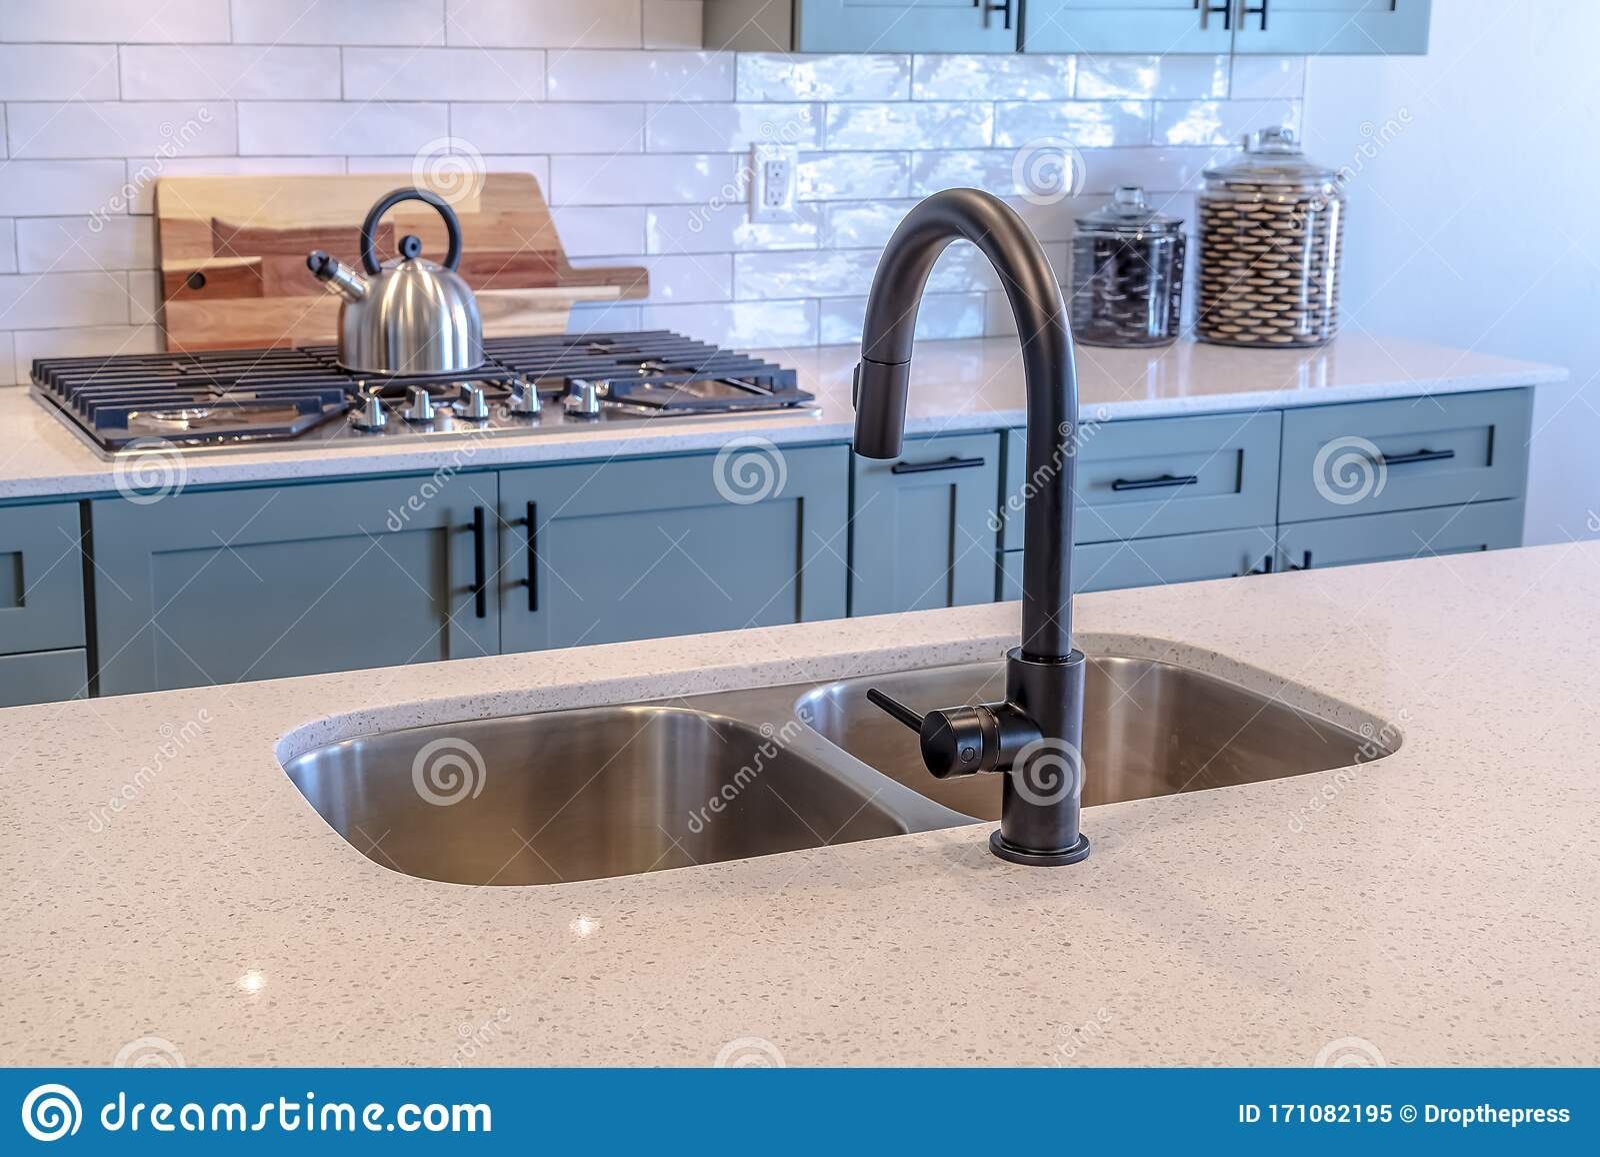 https www dreamstime com kitchen island double sink black faucet against cooktop tile backsplash wooden cabinets handles can also be seen image171082195